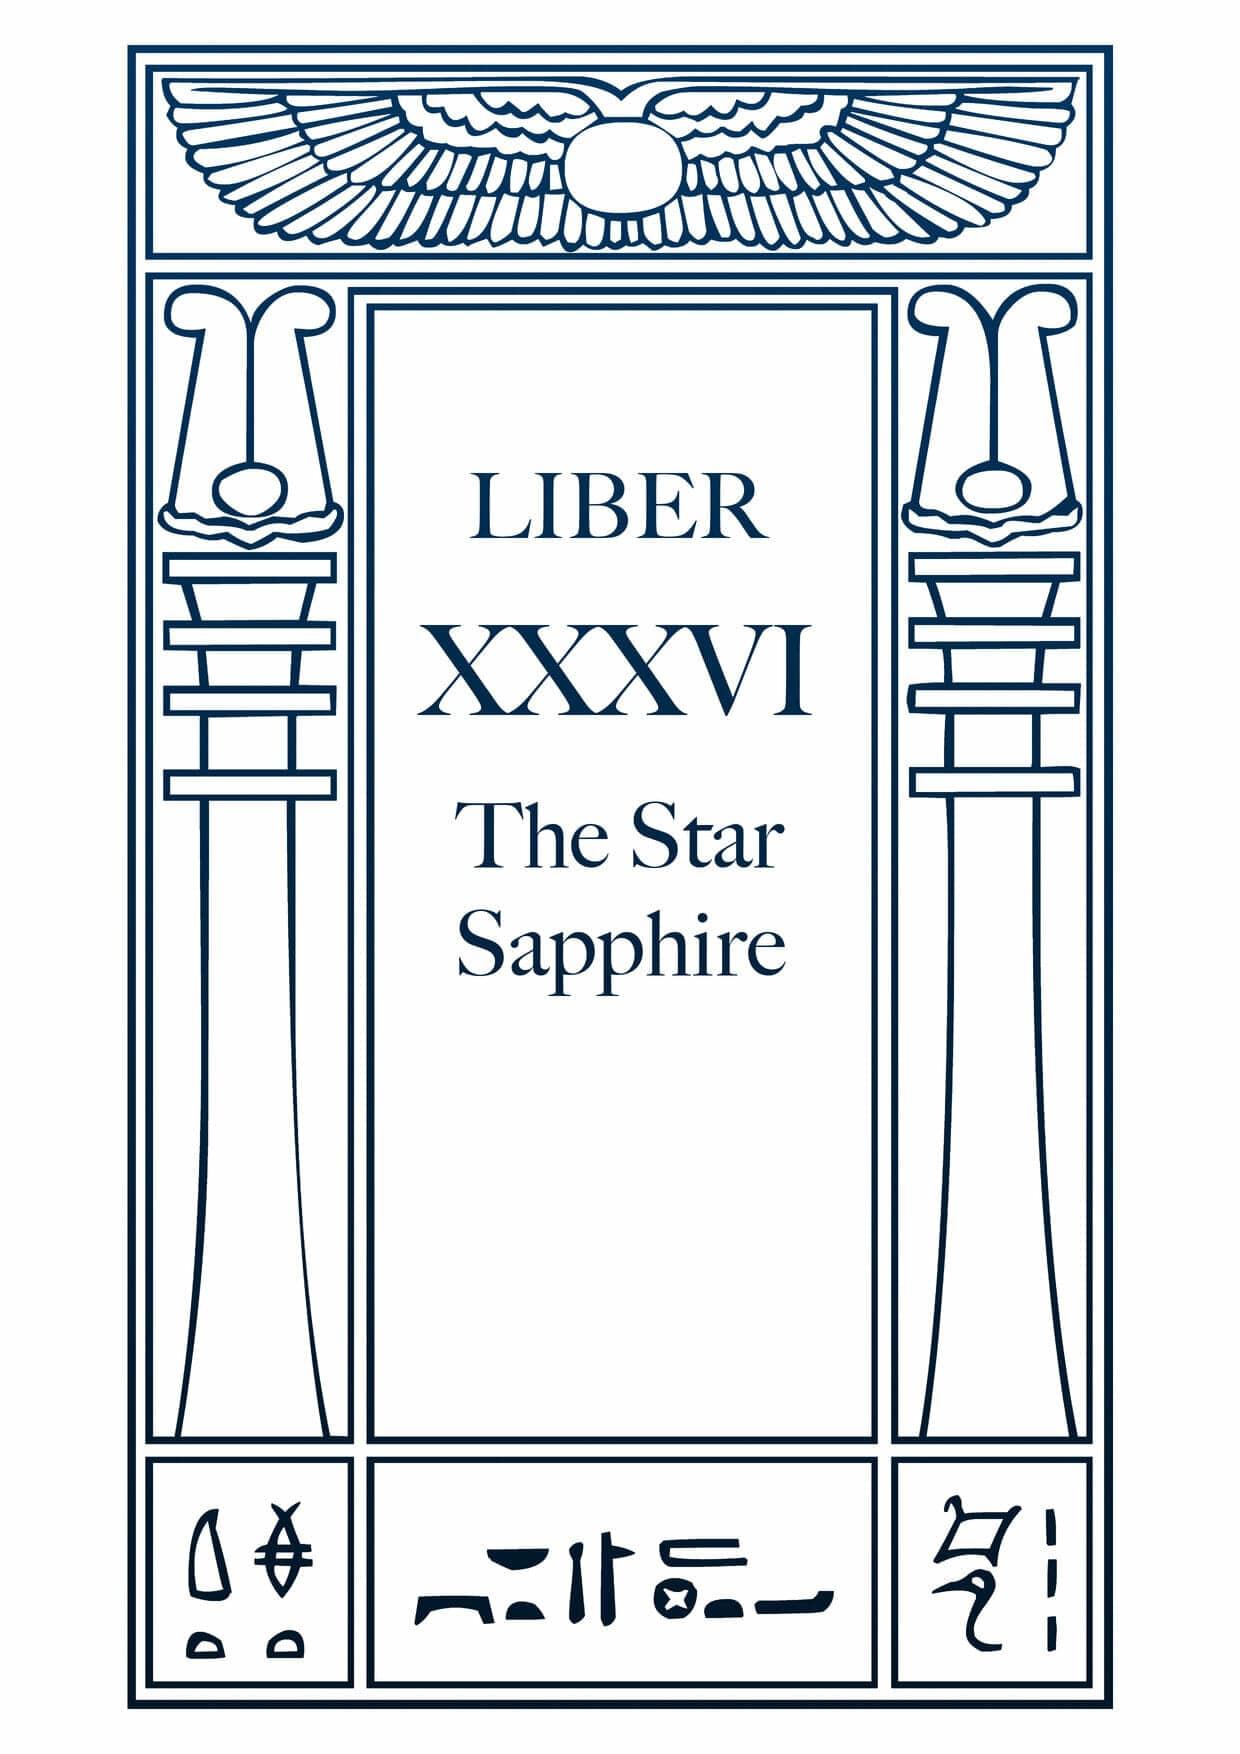 Liber XXXVI – The Star Sapphire